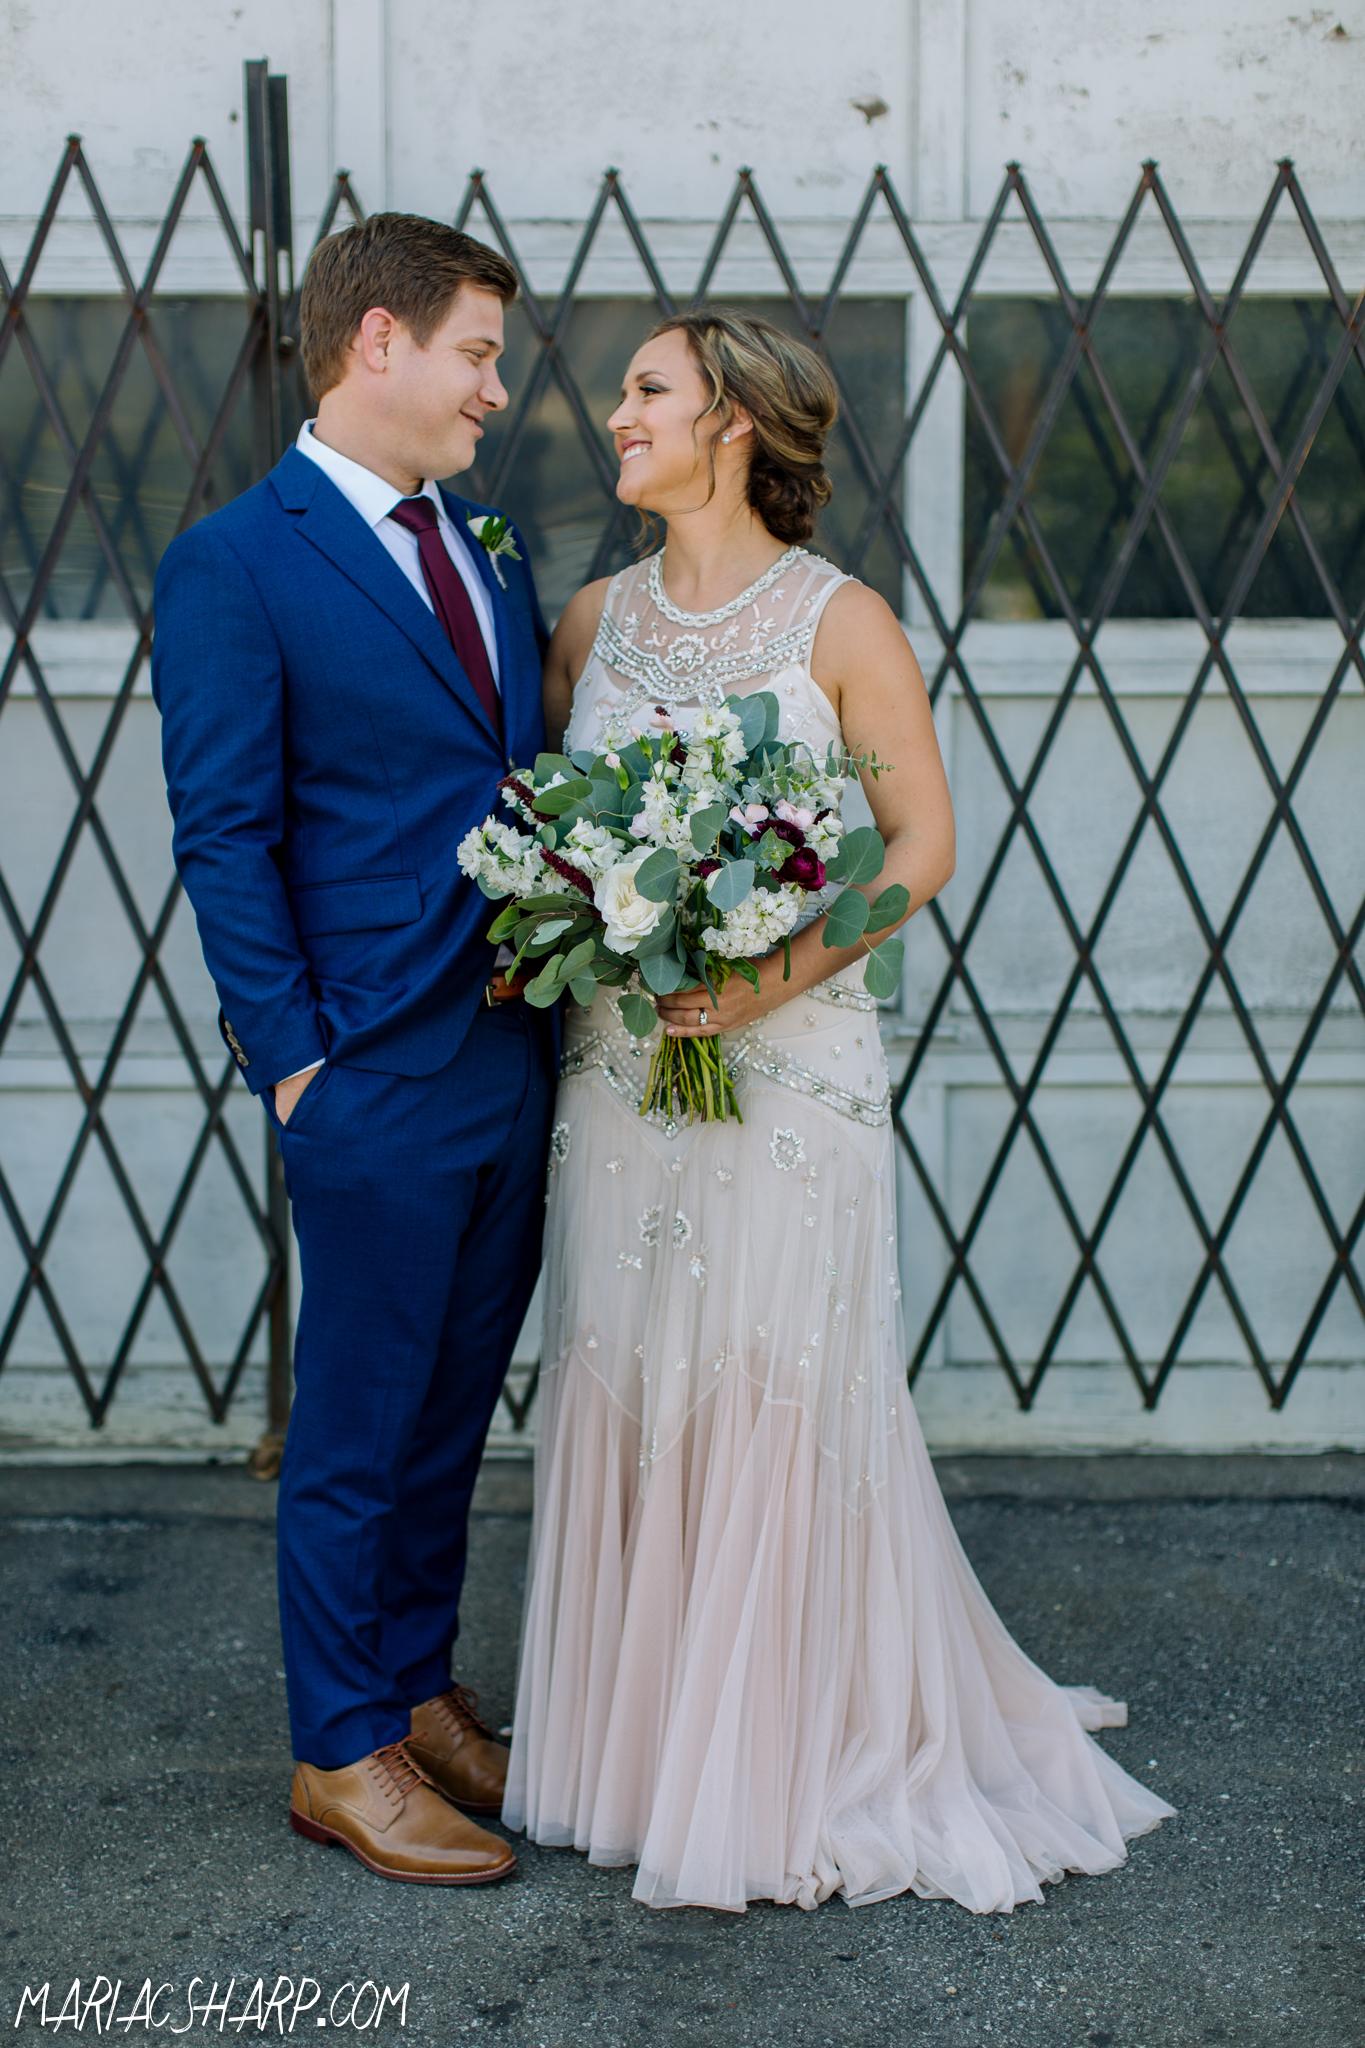 Cassie-Larson-Matt-Seccombe-wedding-20170715-127.jpg